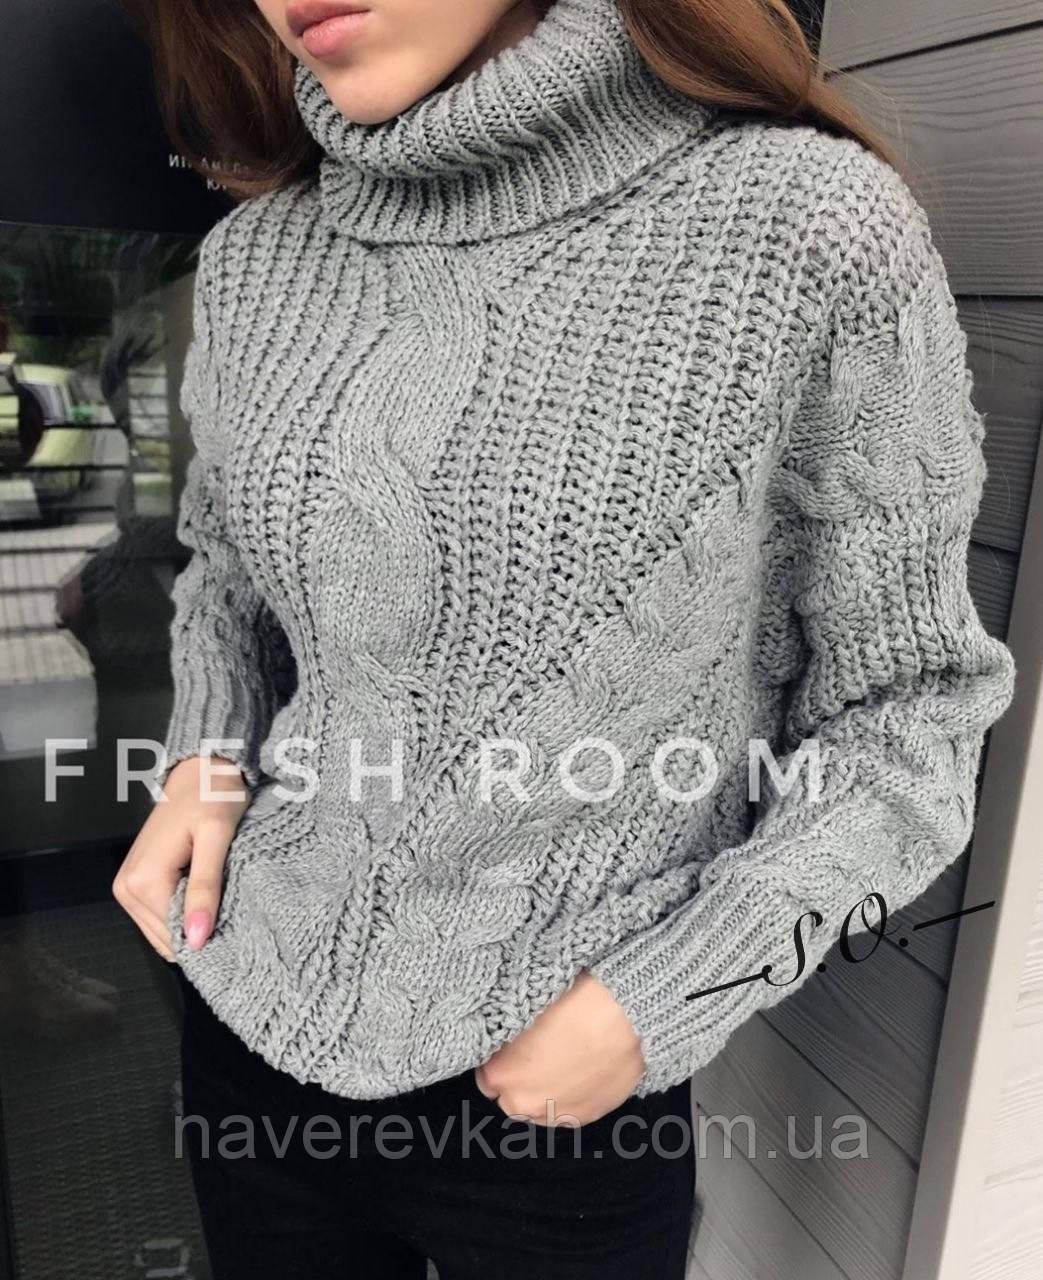 Женский зимний теплый свитер с косичками вязка молочный бежевый серый пудра 42-46